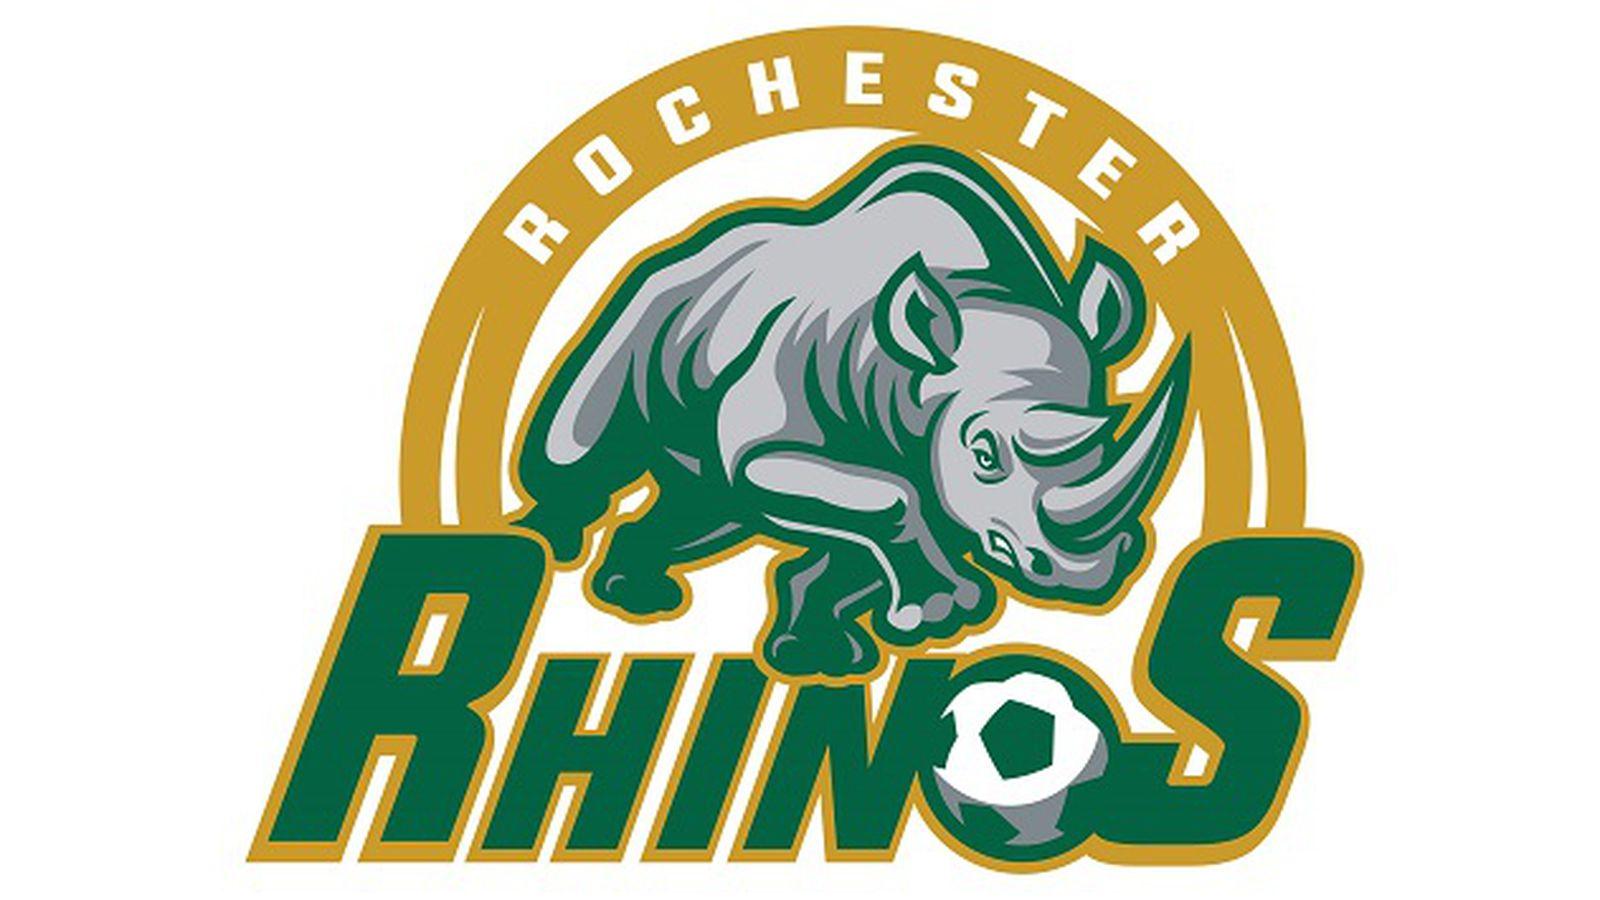 Rochesterrhinos2016secondary.0.0